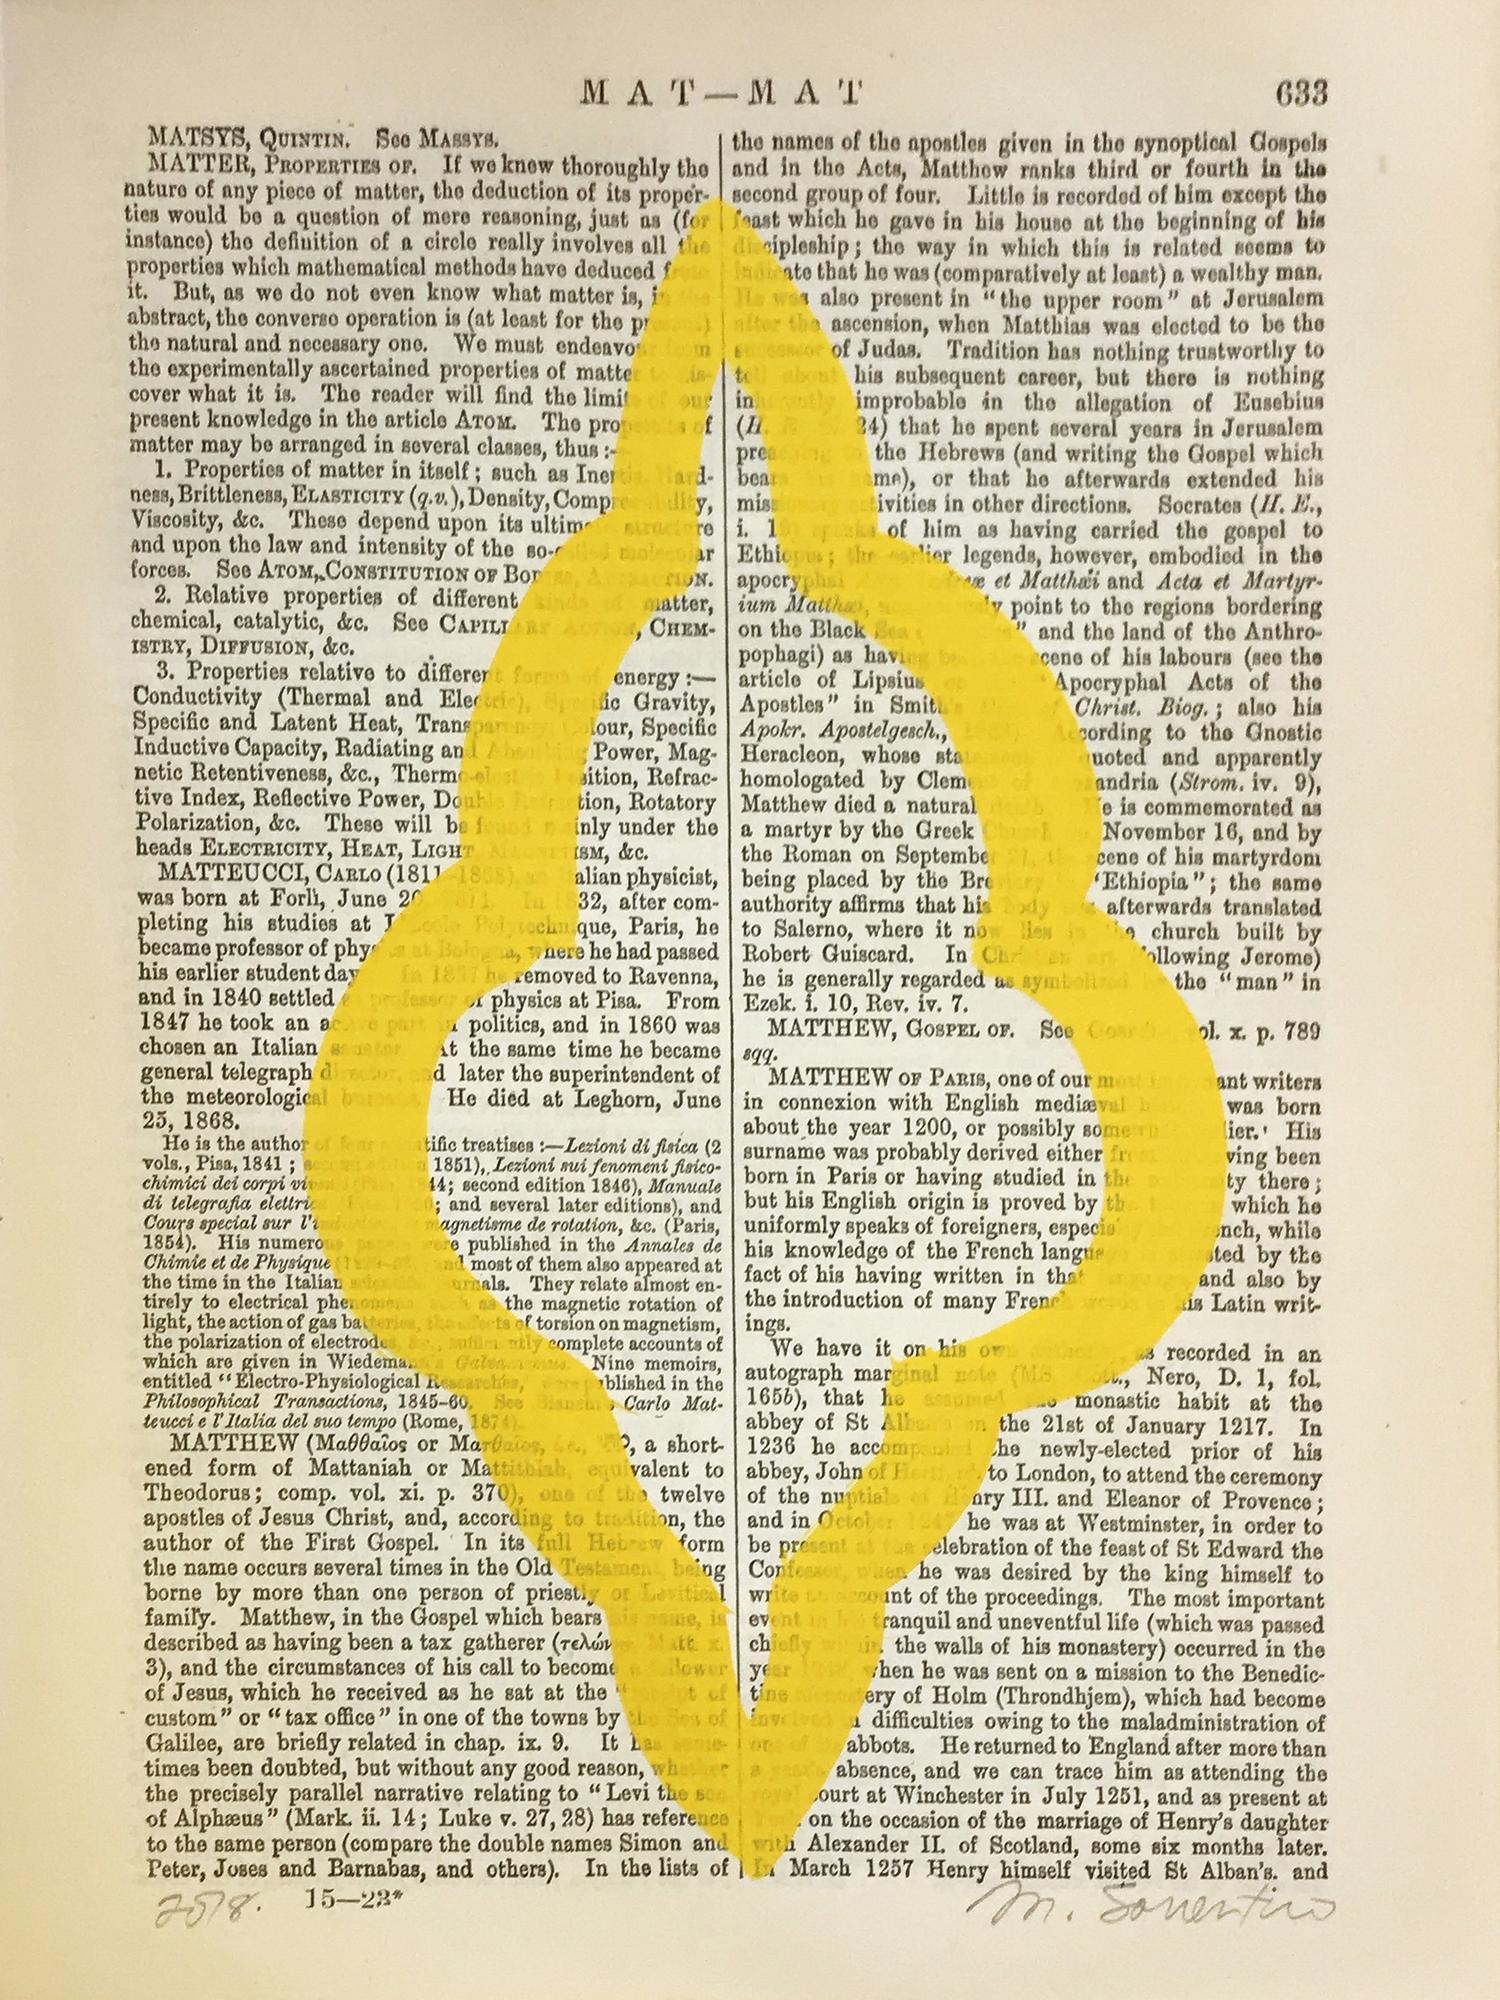 Mat-Mat Yellow 633 by Michela Sorrentino